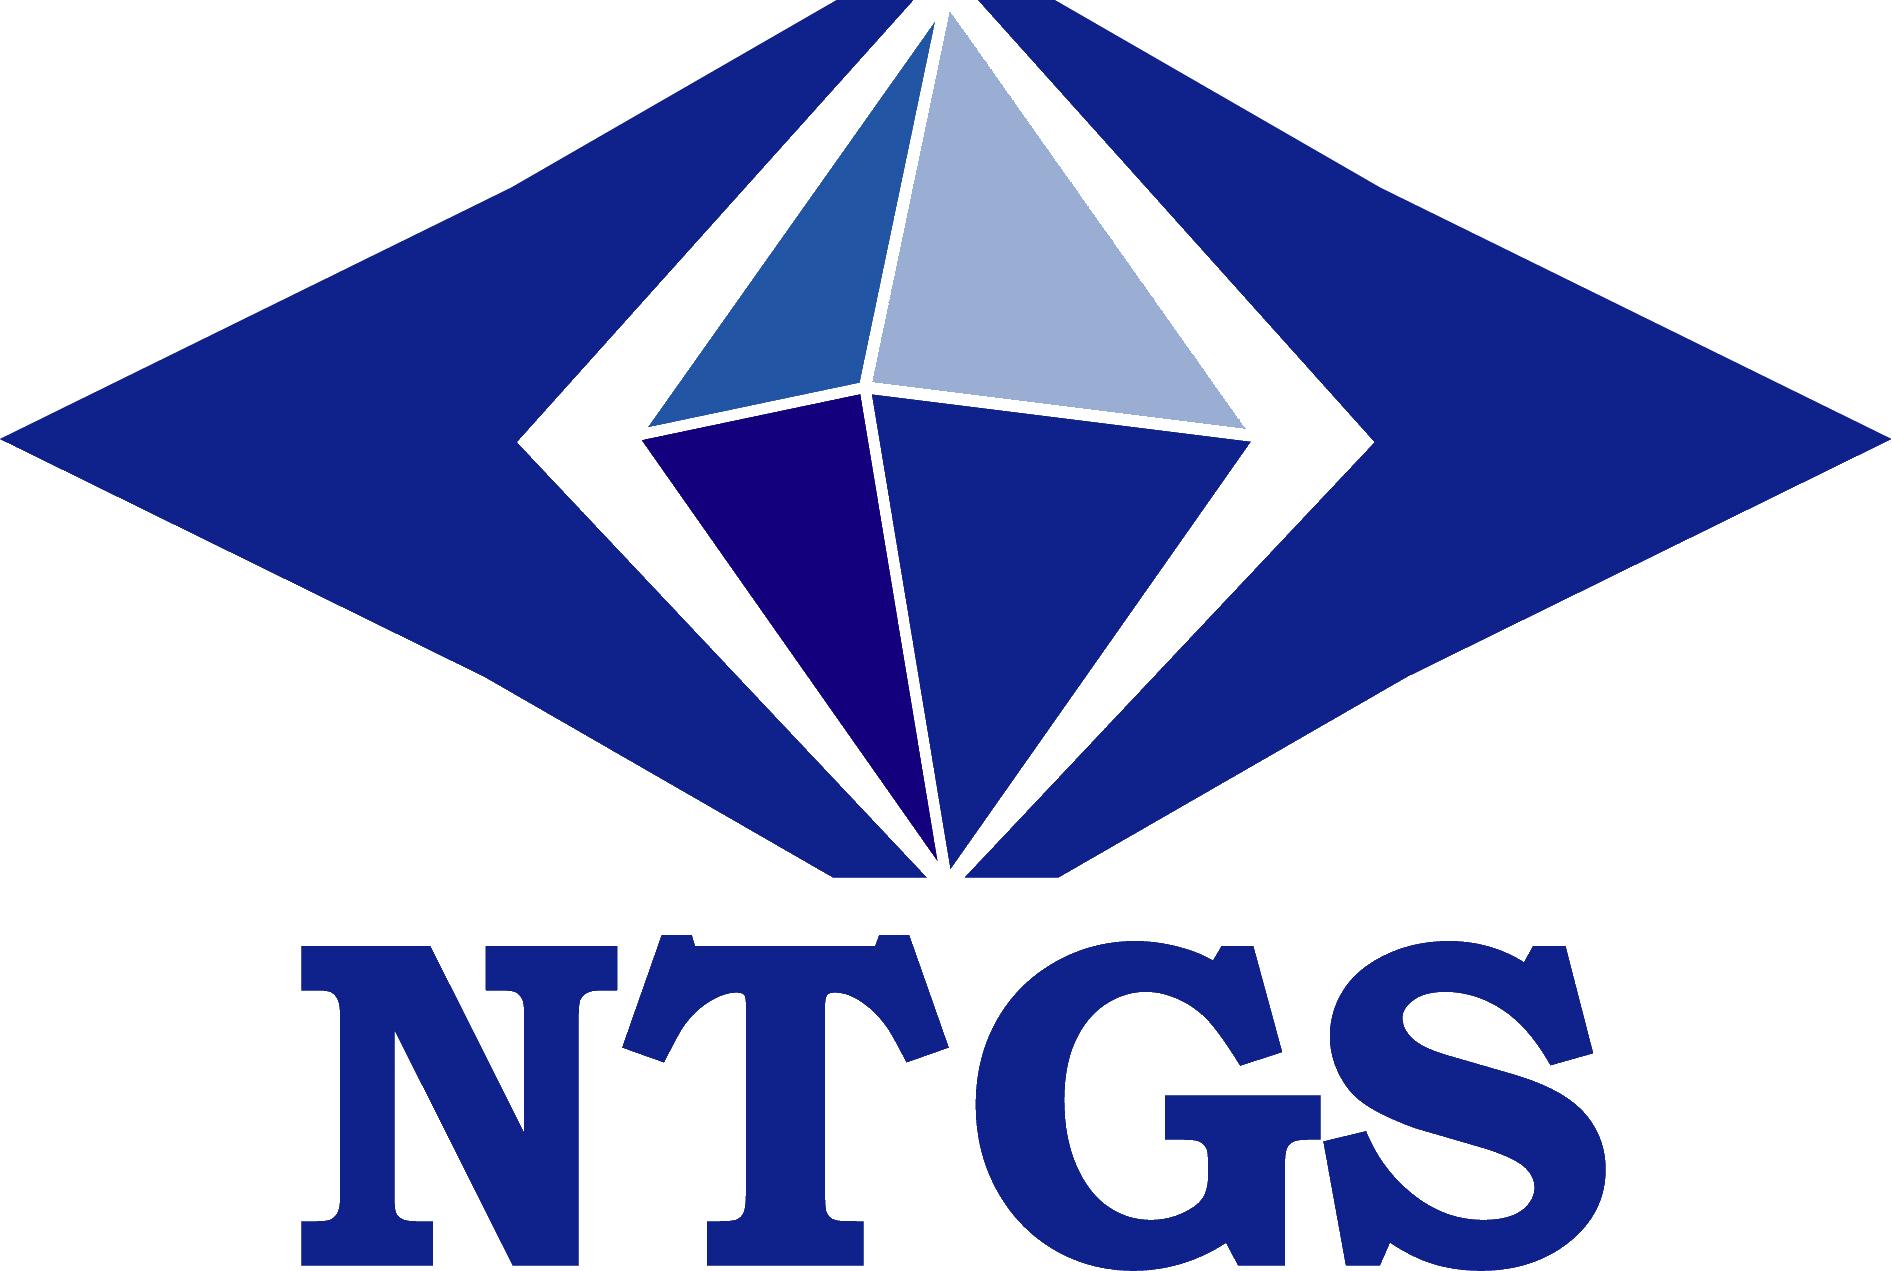 logo logo 标识 标志 设计 矢量 矢量图 素材 图标 1892_1271